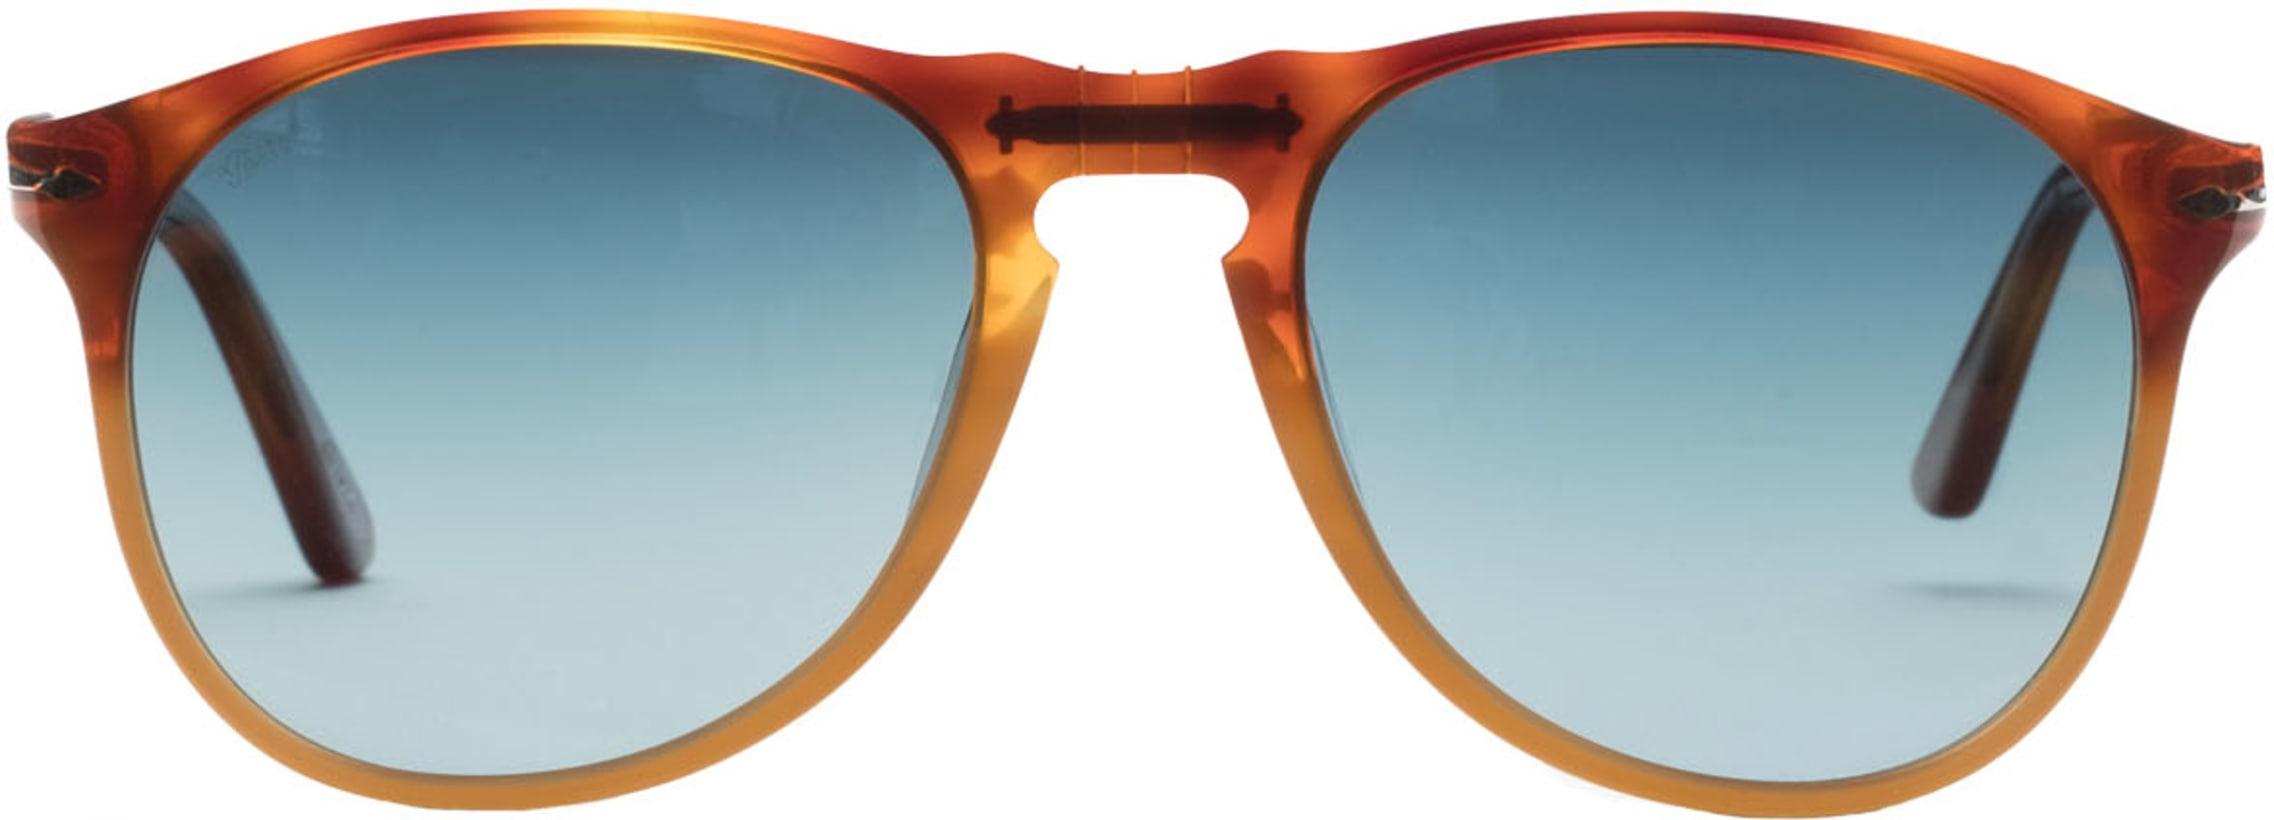 21b10af056c90 Persol. Icon Vintage Celebration Polarized 649 Sunglasses - Resina e Sale